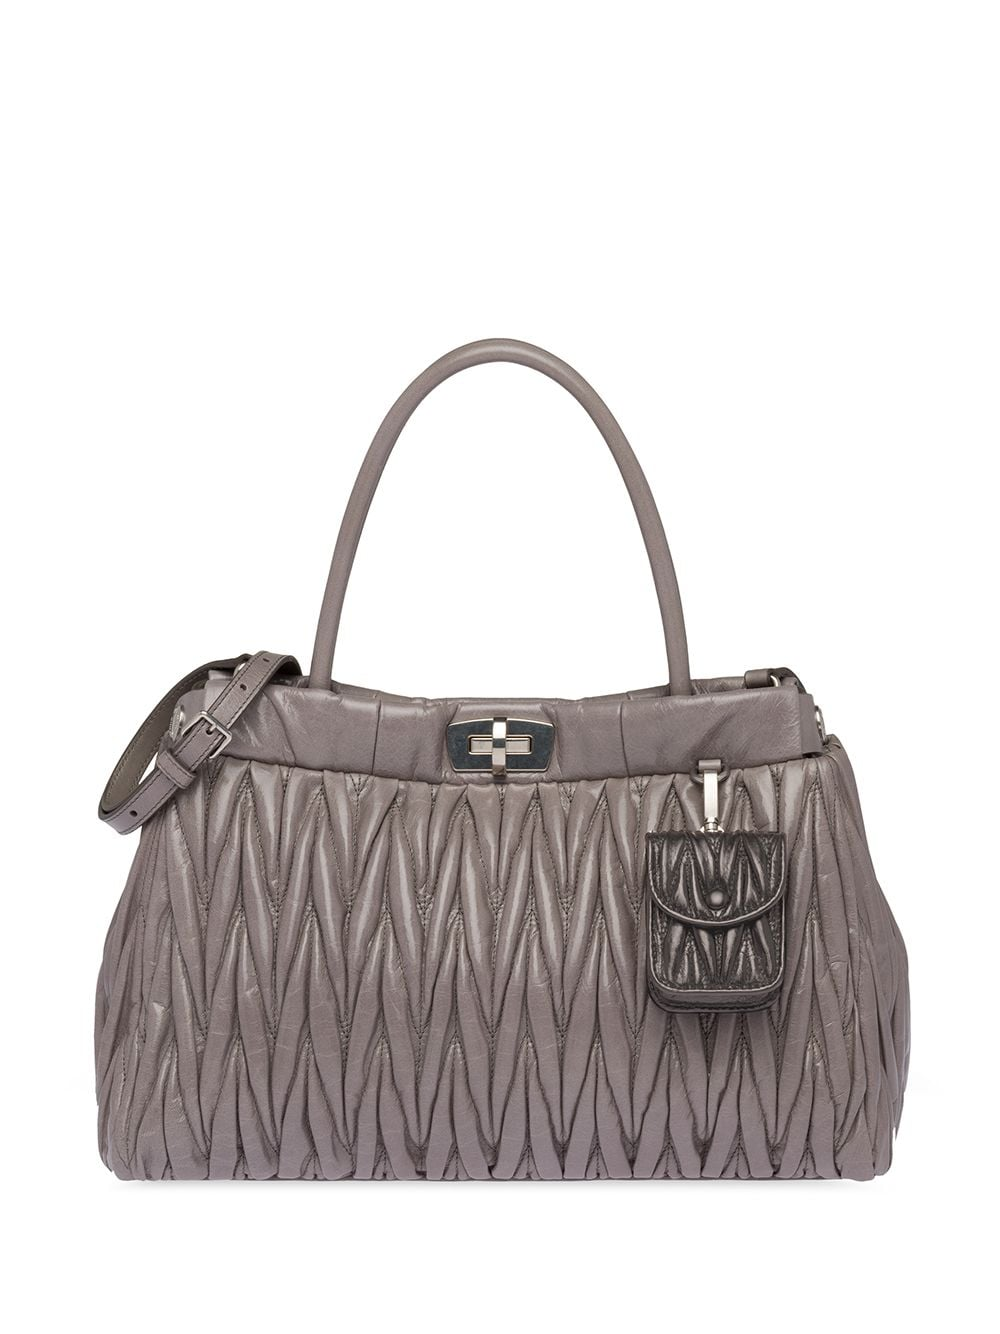 Miu Miu Handtasche aus Matelassé-Leder - Grau